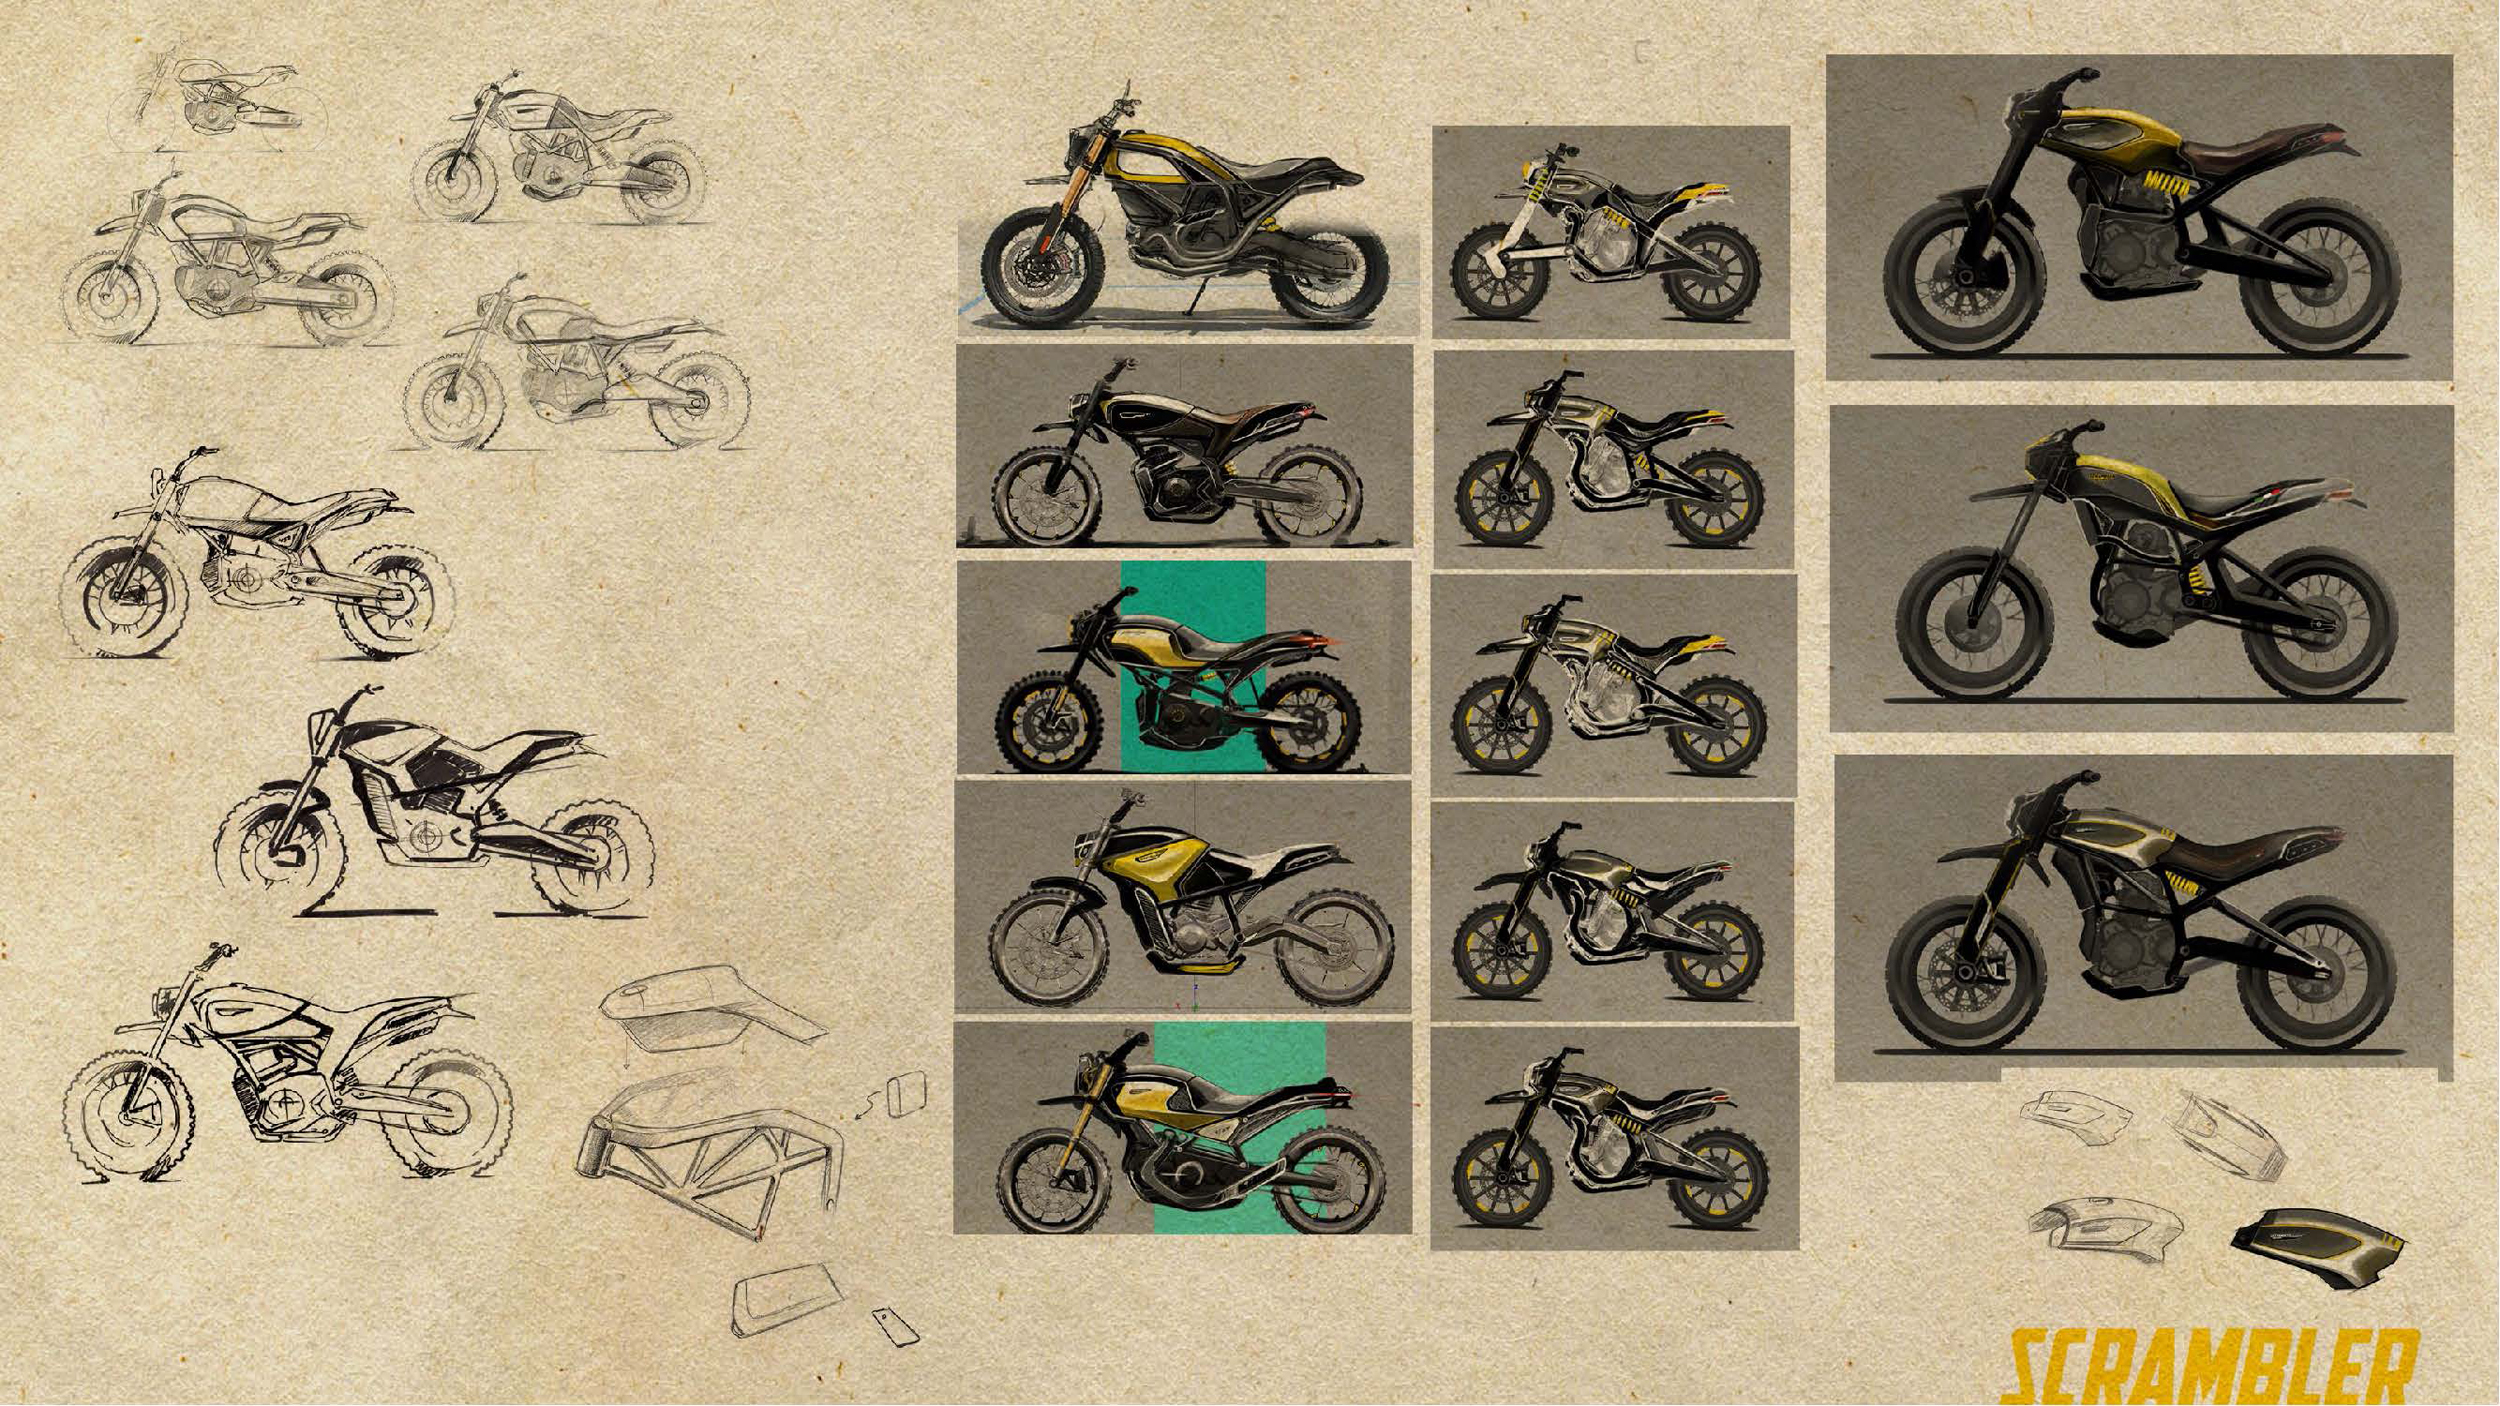 200511 Scrambler Ducati of the future - sketches by Peter Harkins (4)